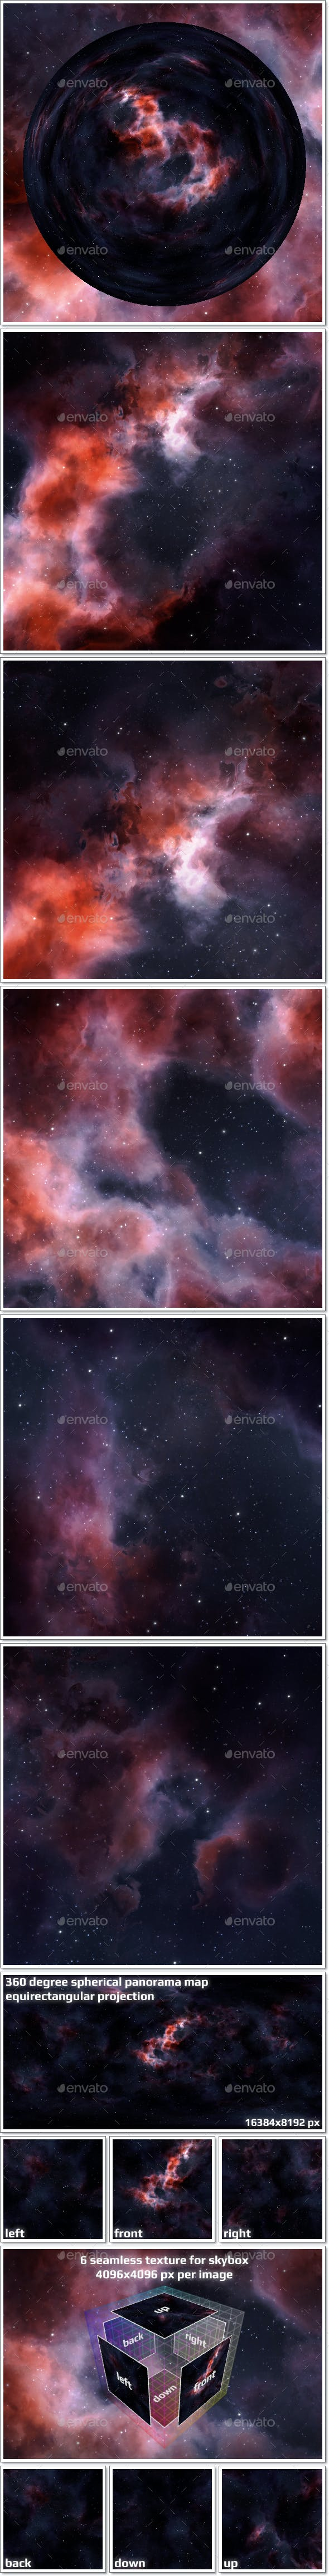 Nebula Space Environment HDRI Map 023 - 3DOcean Item for Sale